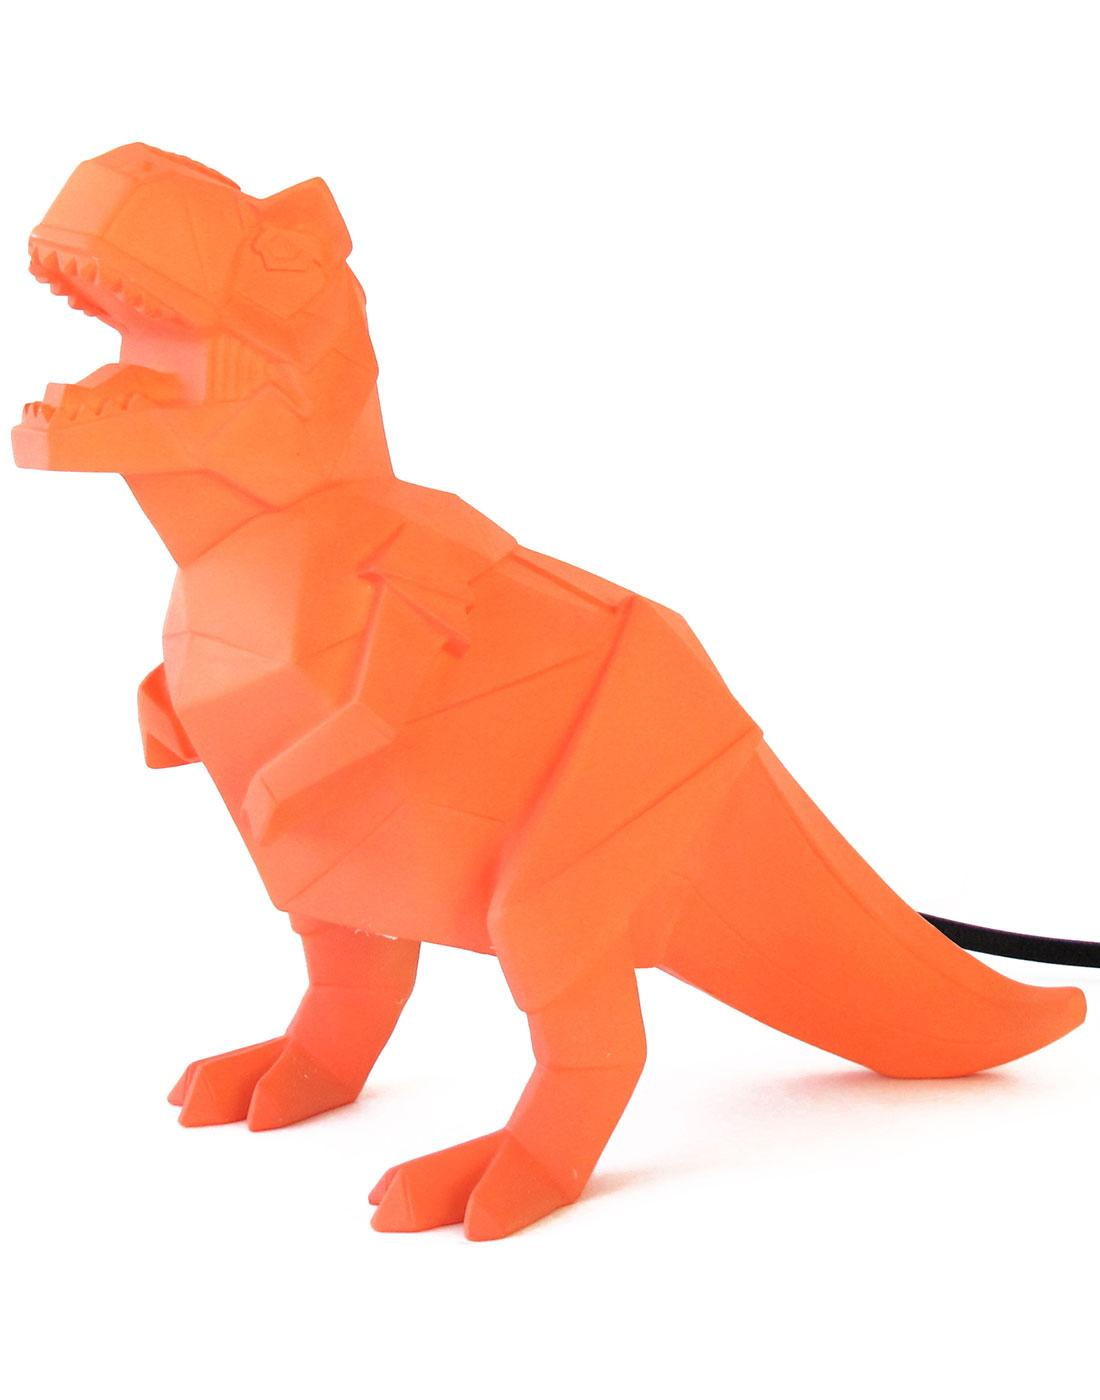 DISASTER DESIGNS T-Rex Dinosaur Origami Lamp